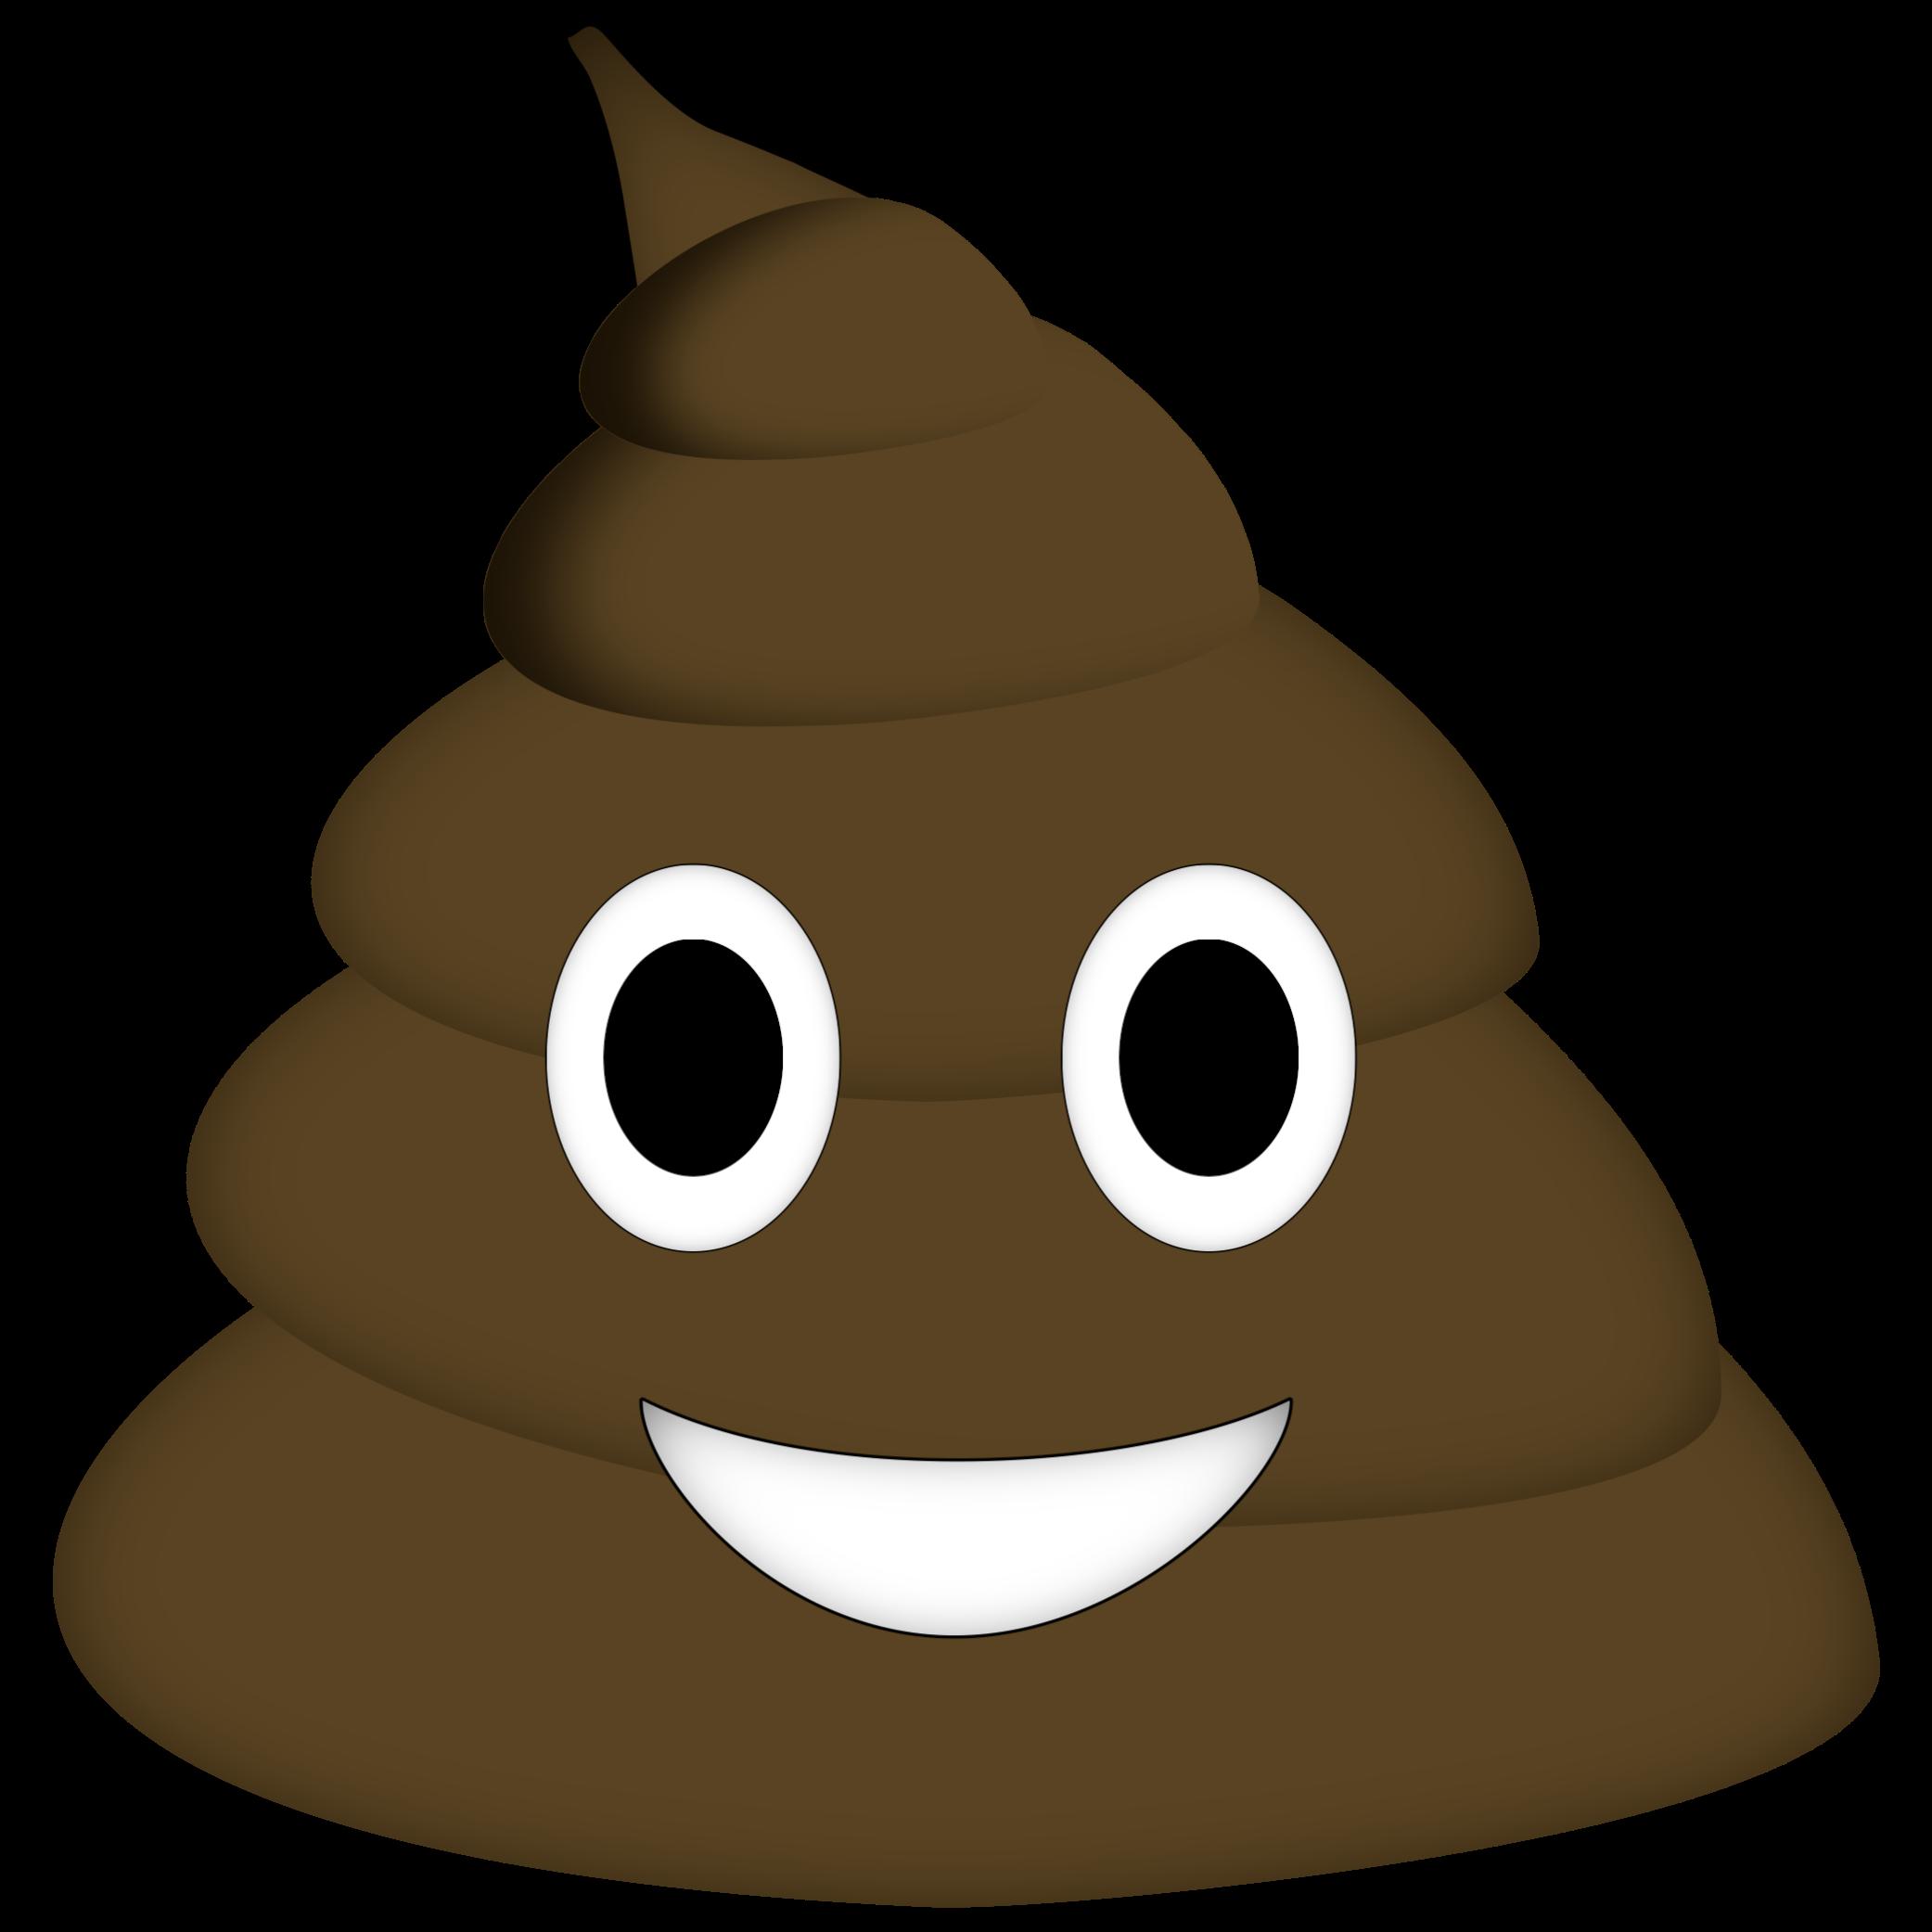 image royalty free download transparent poop background #106341525